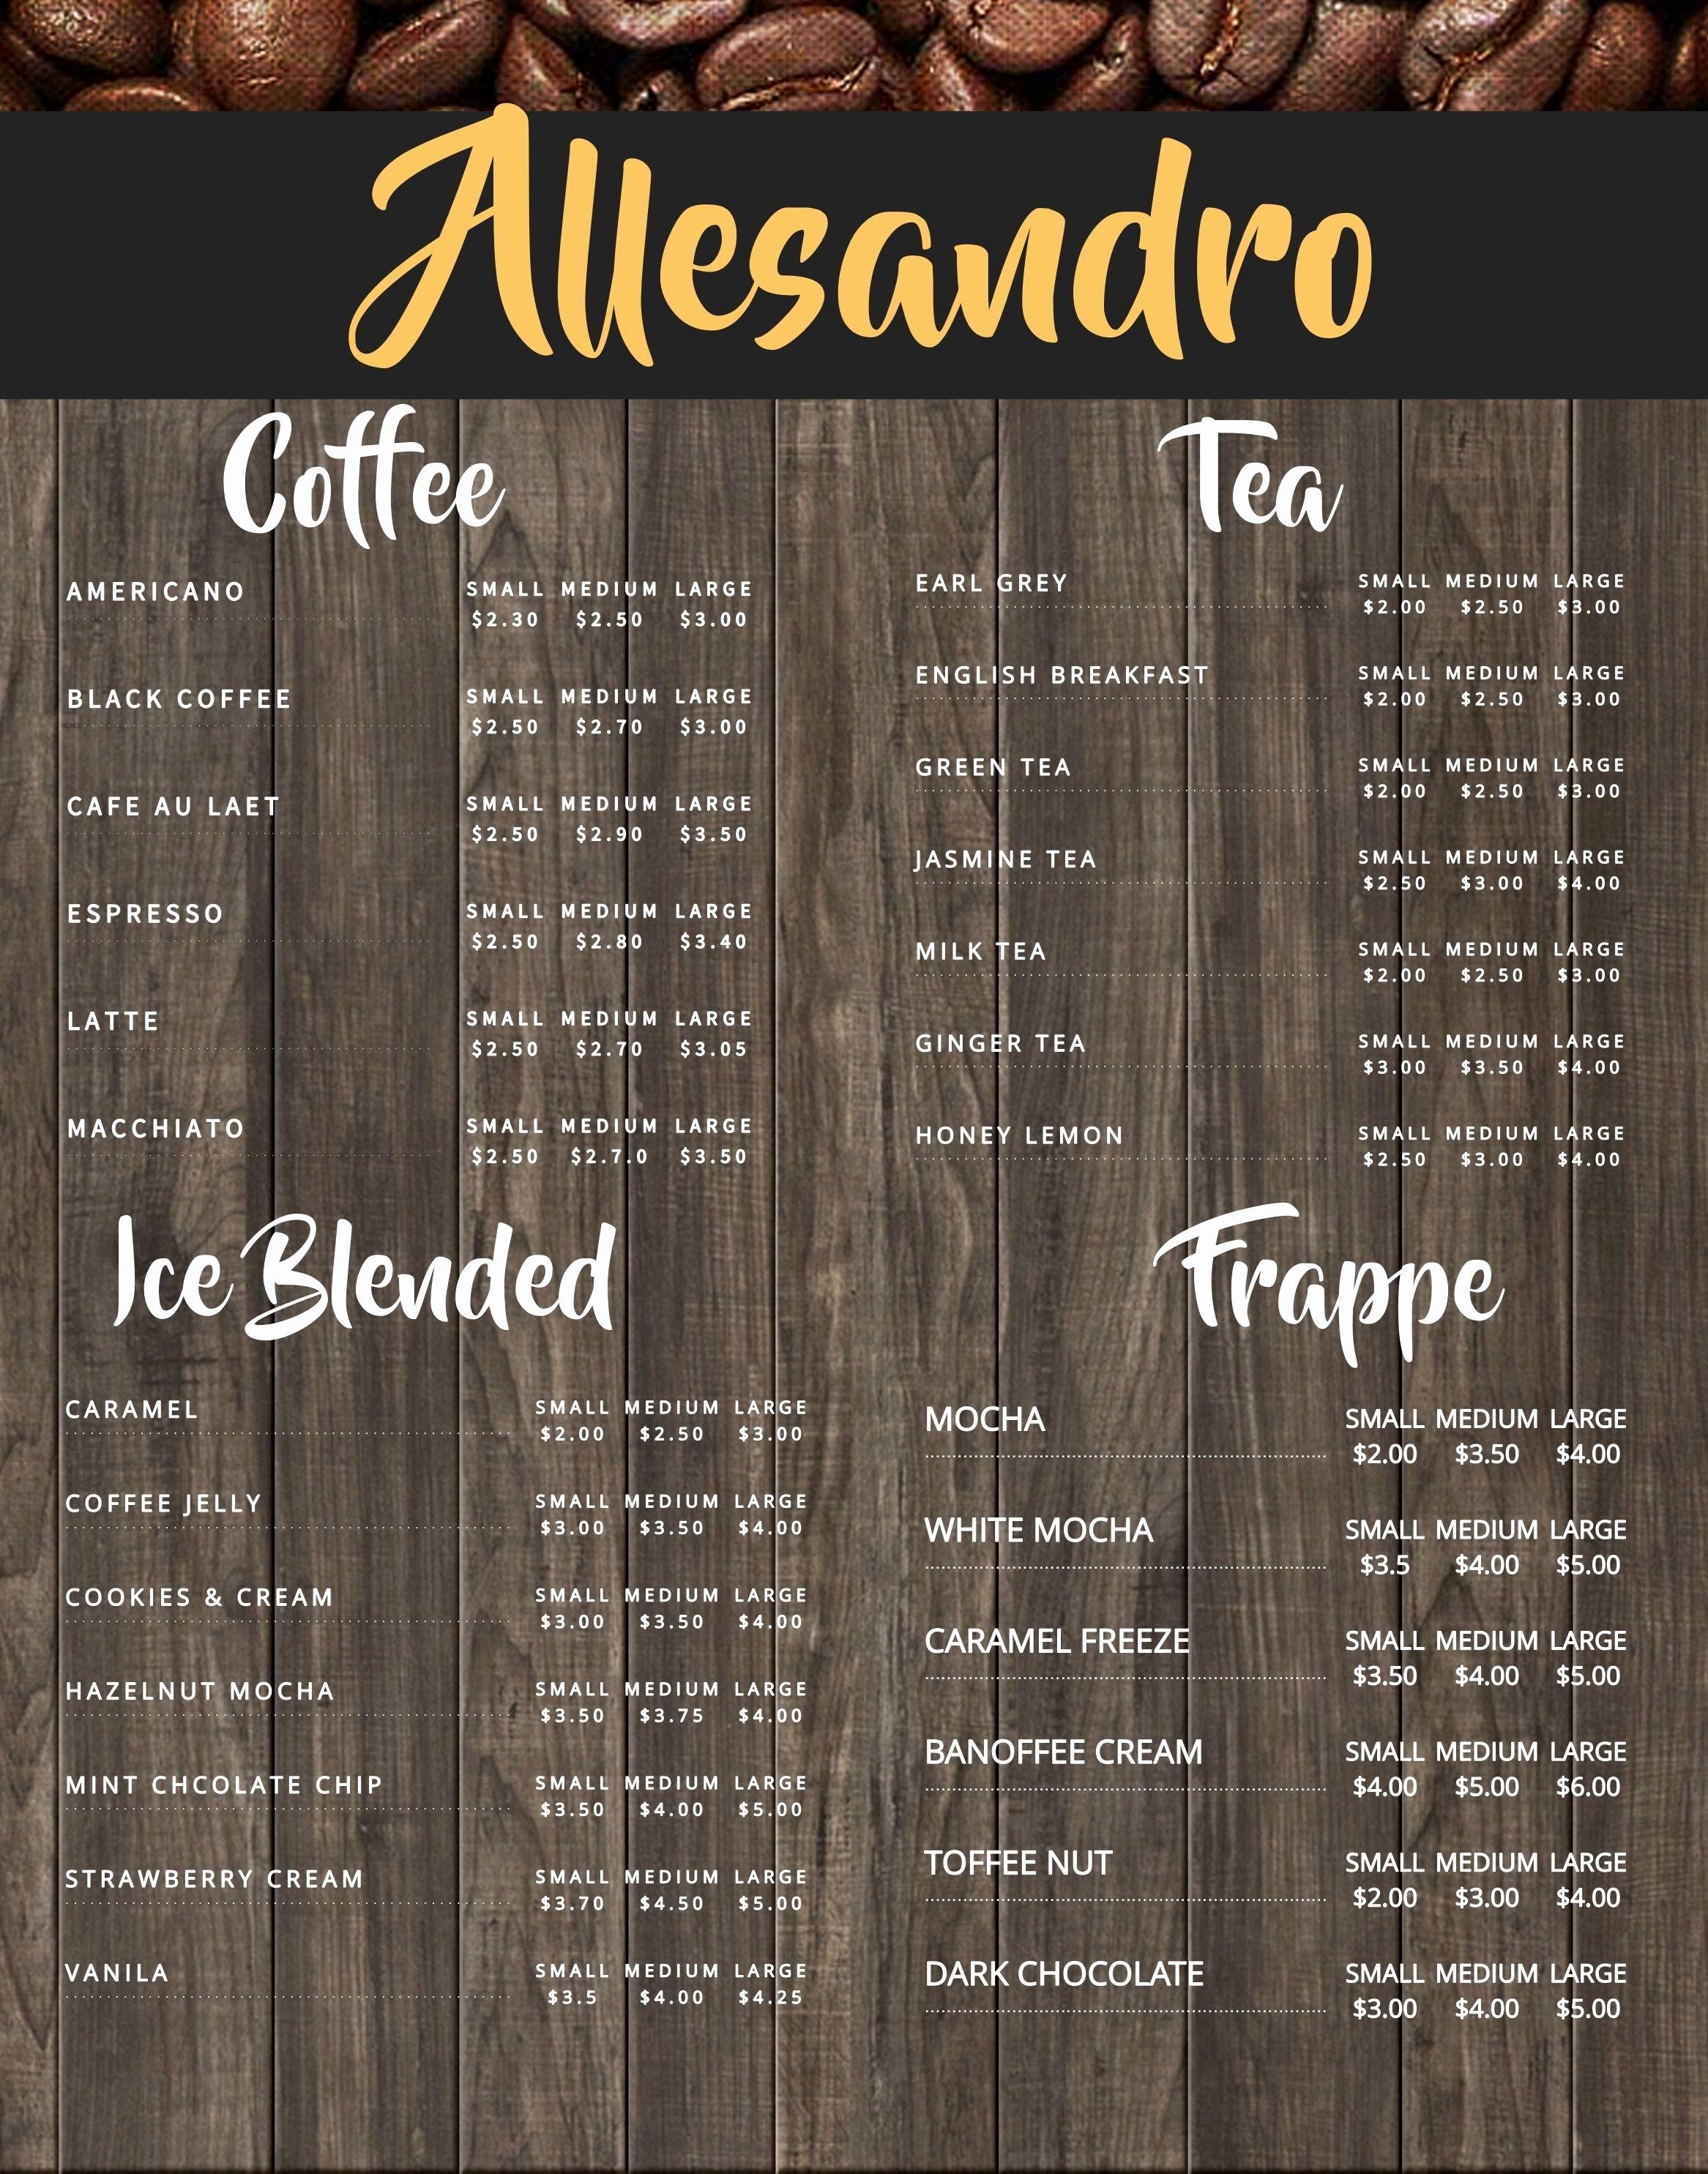 Coffee Shop Menu Template Awesome Coffee Shop Menu Board Design Template to Customize